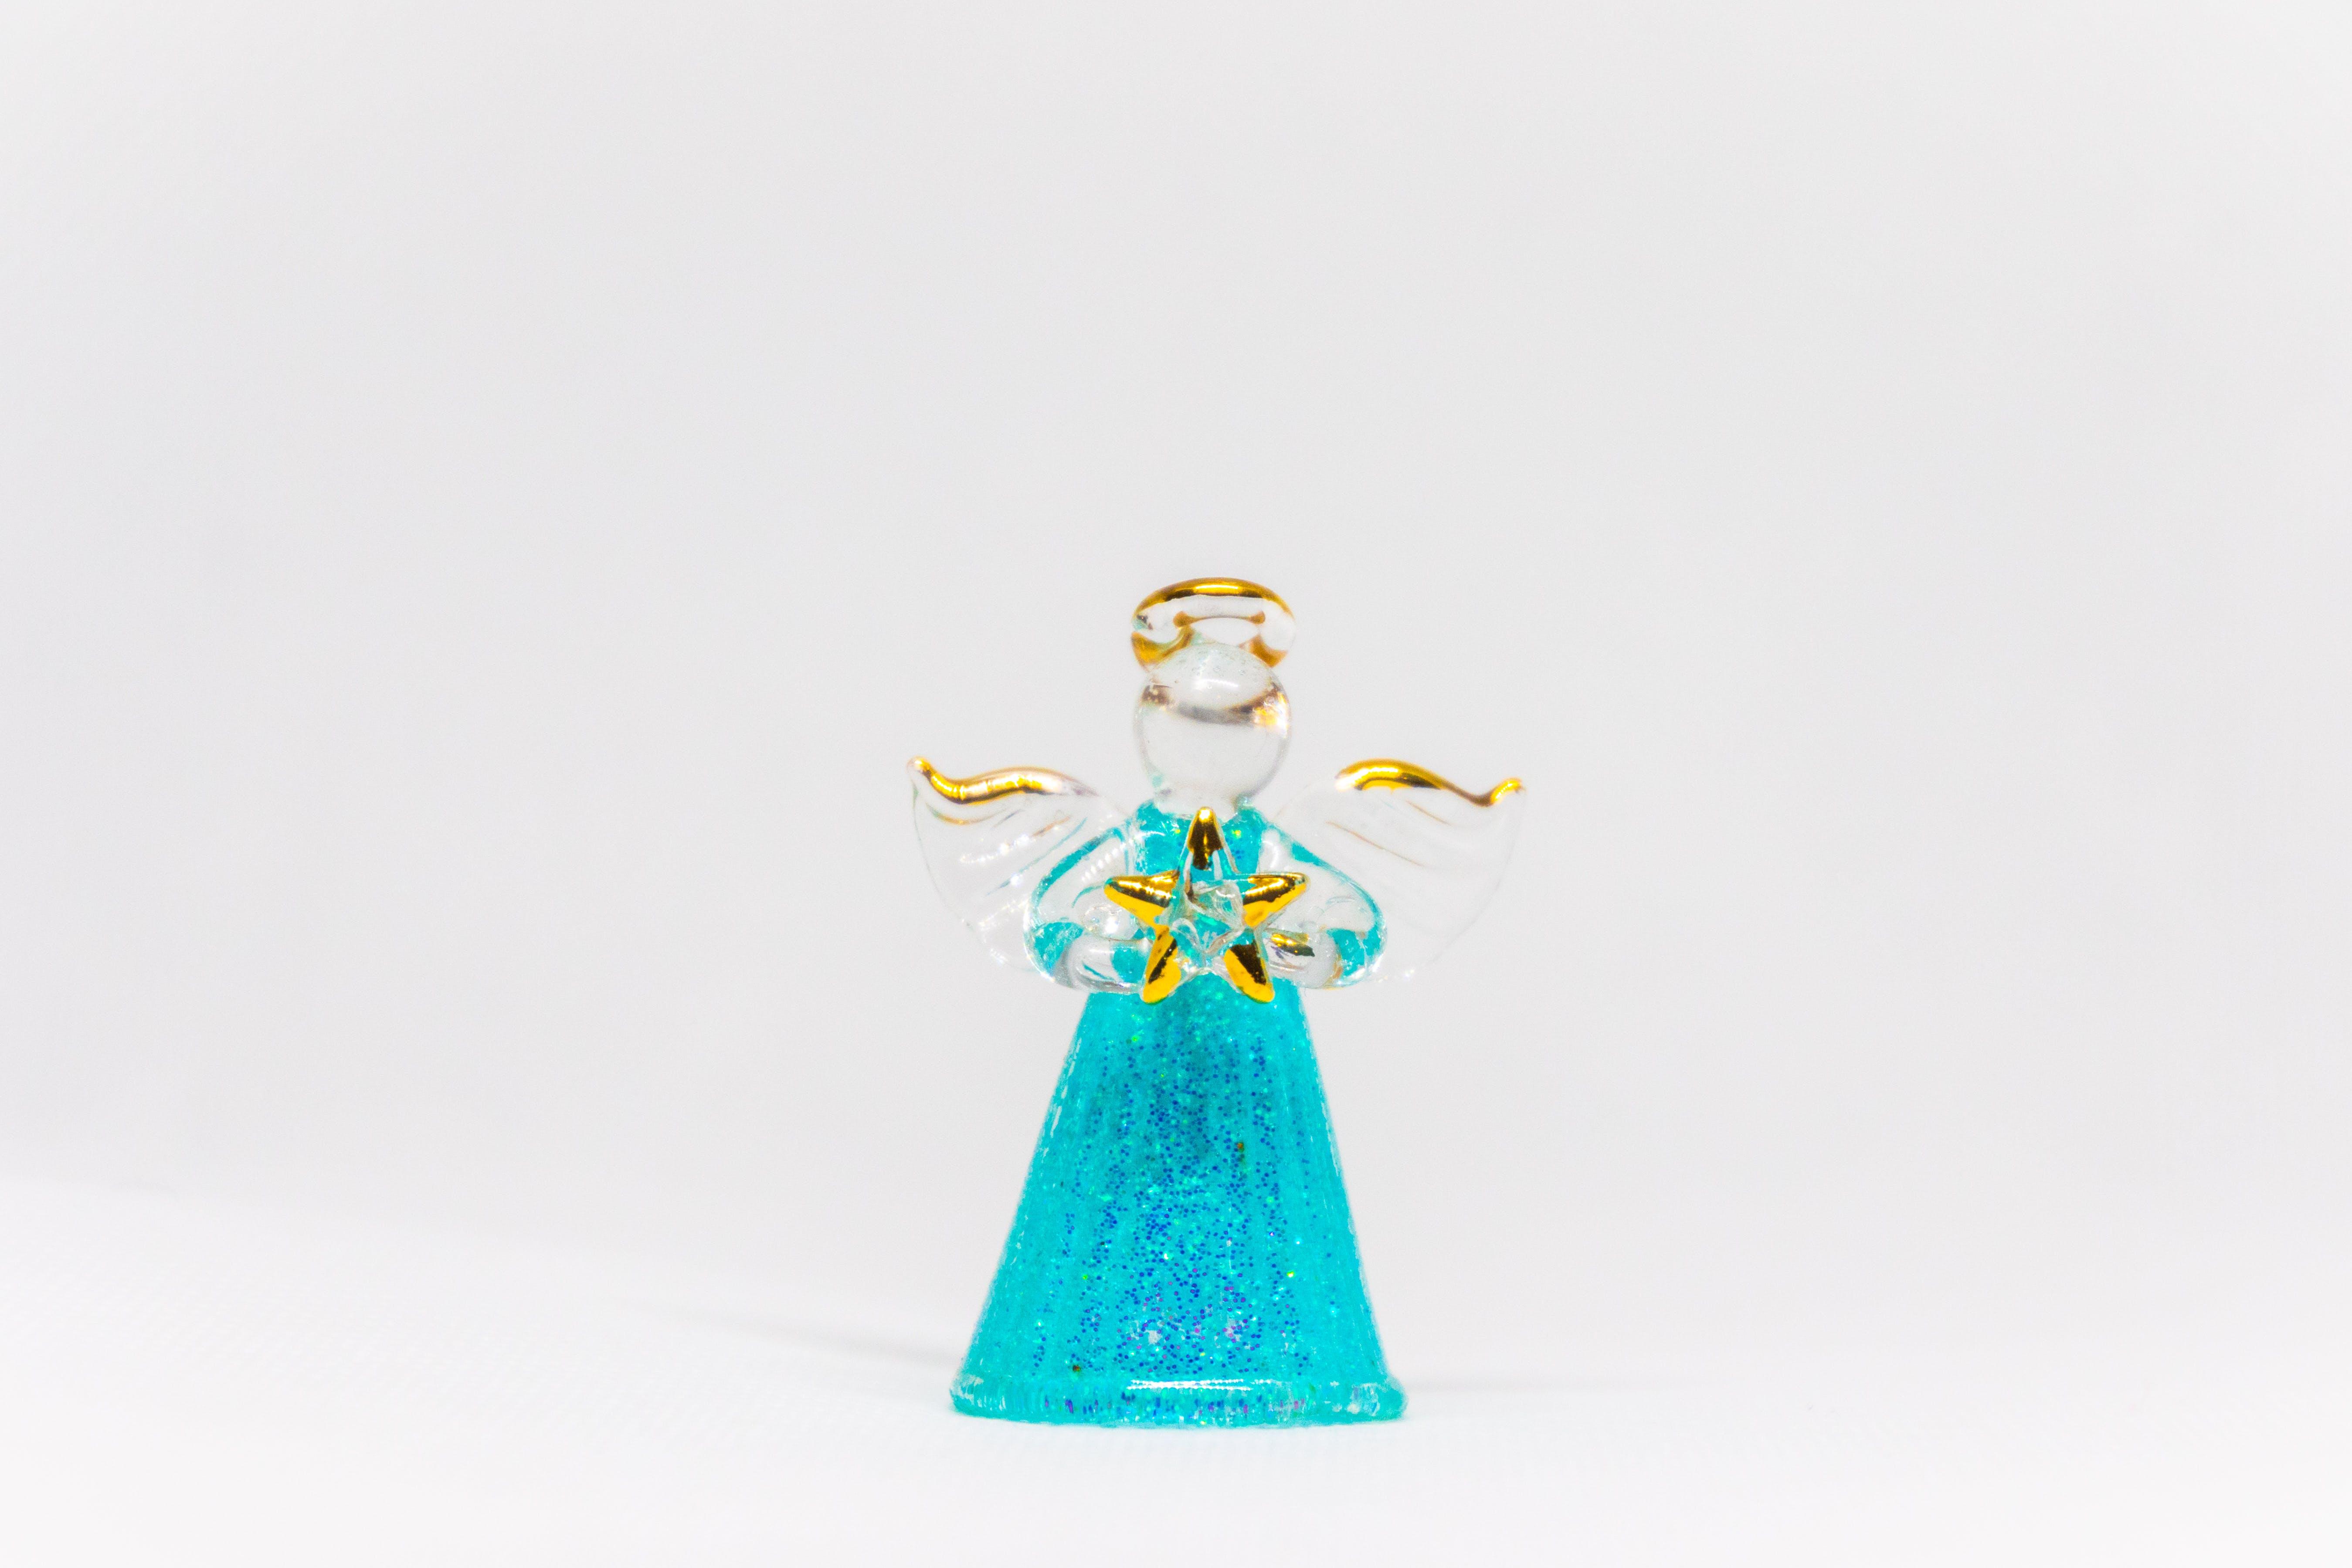 Teal Glass Angel Figurine